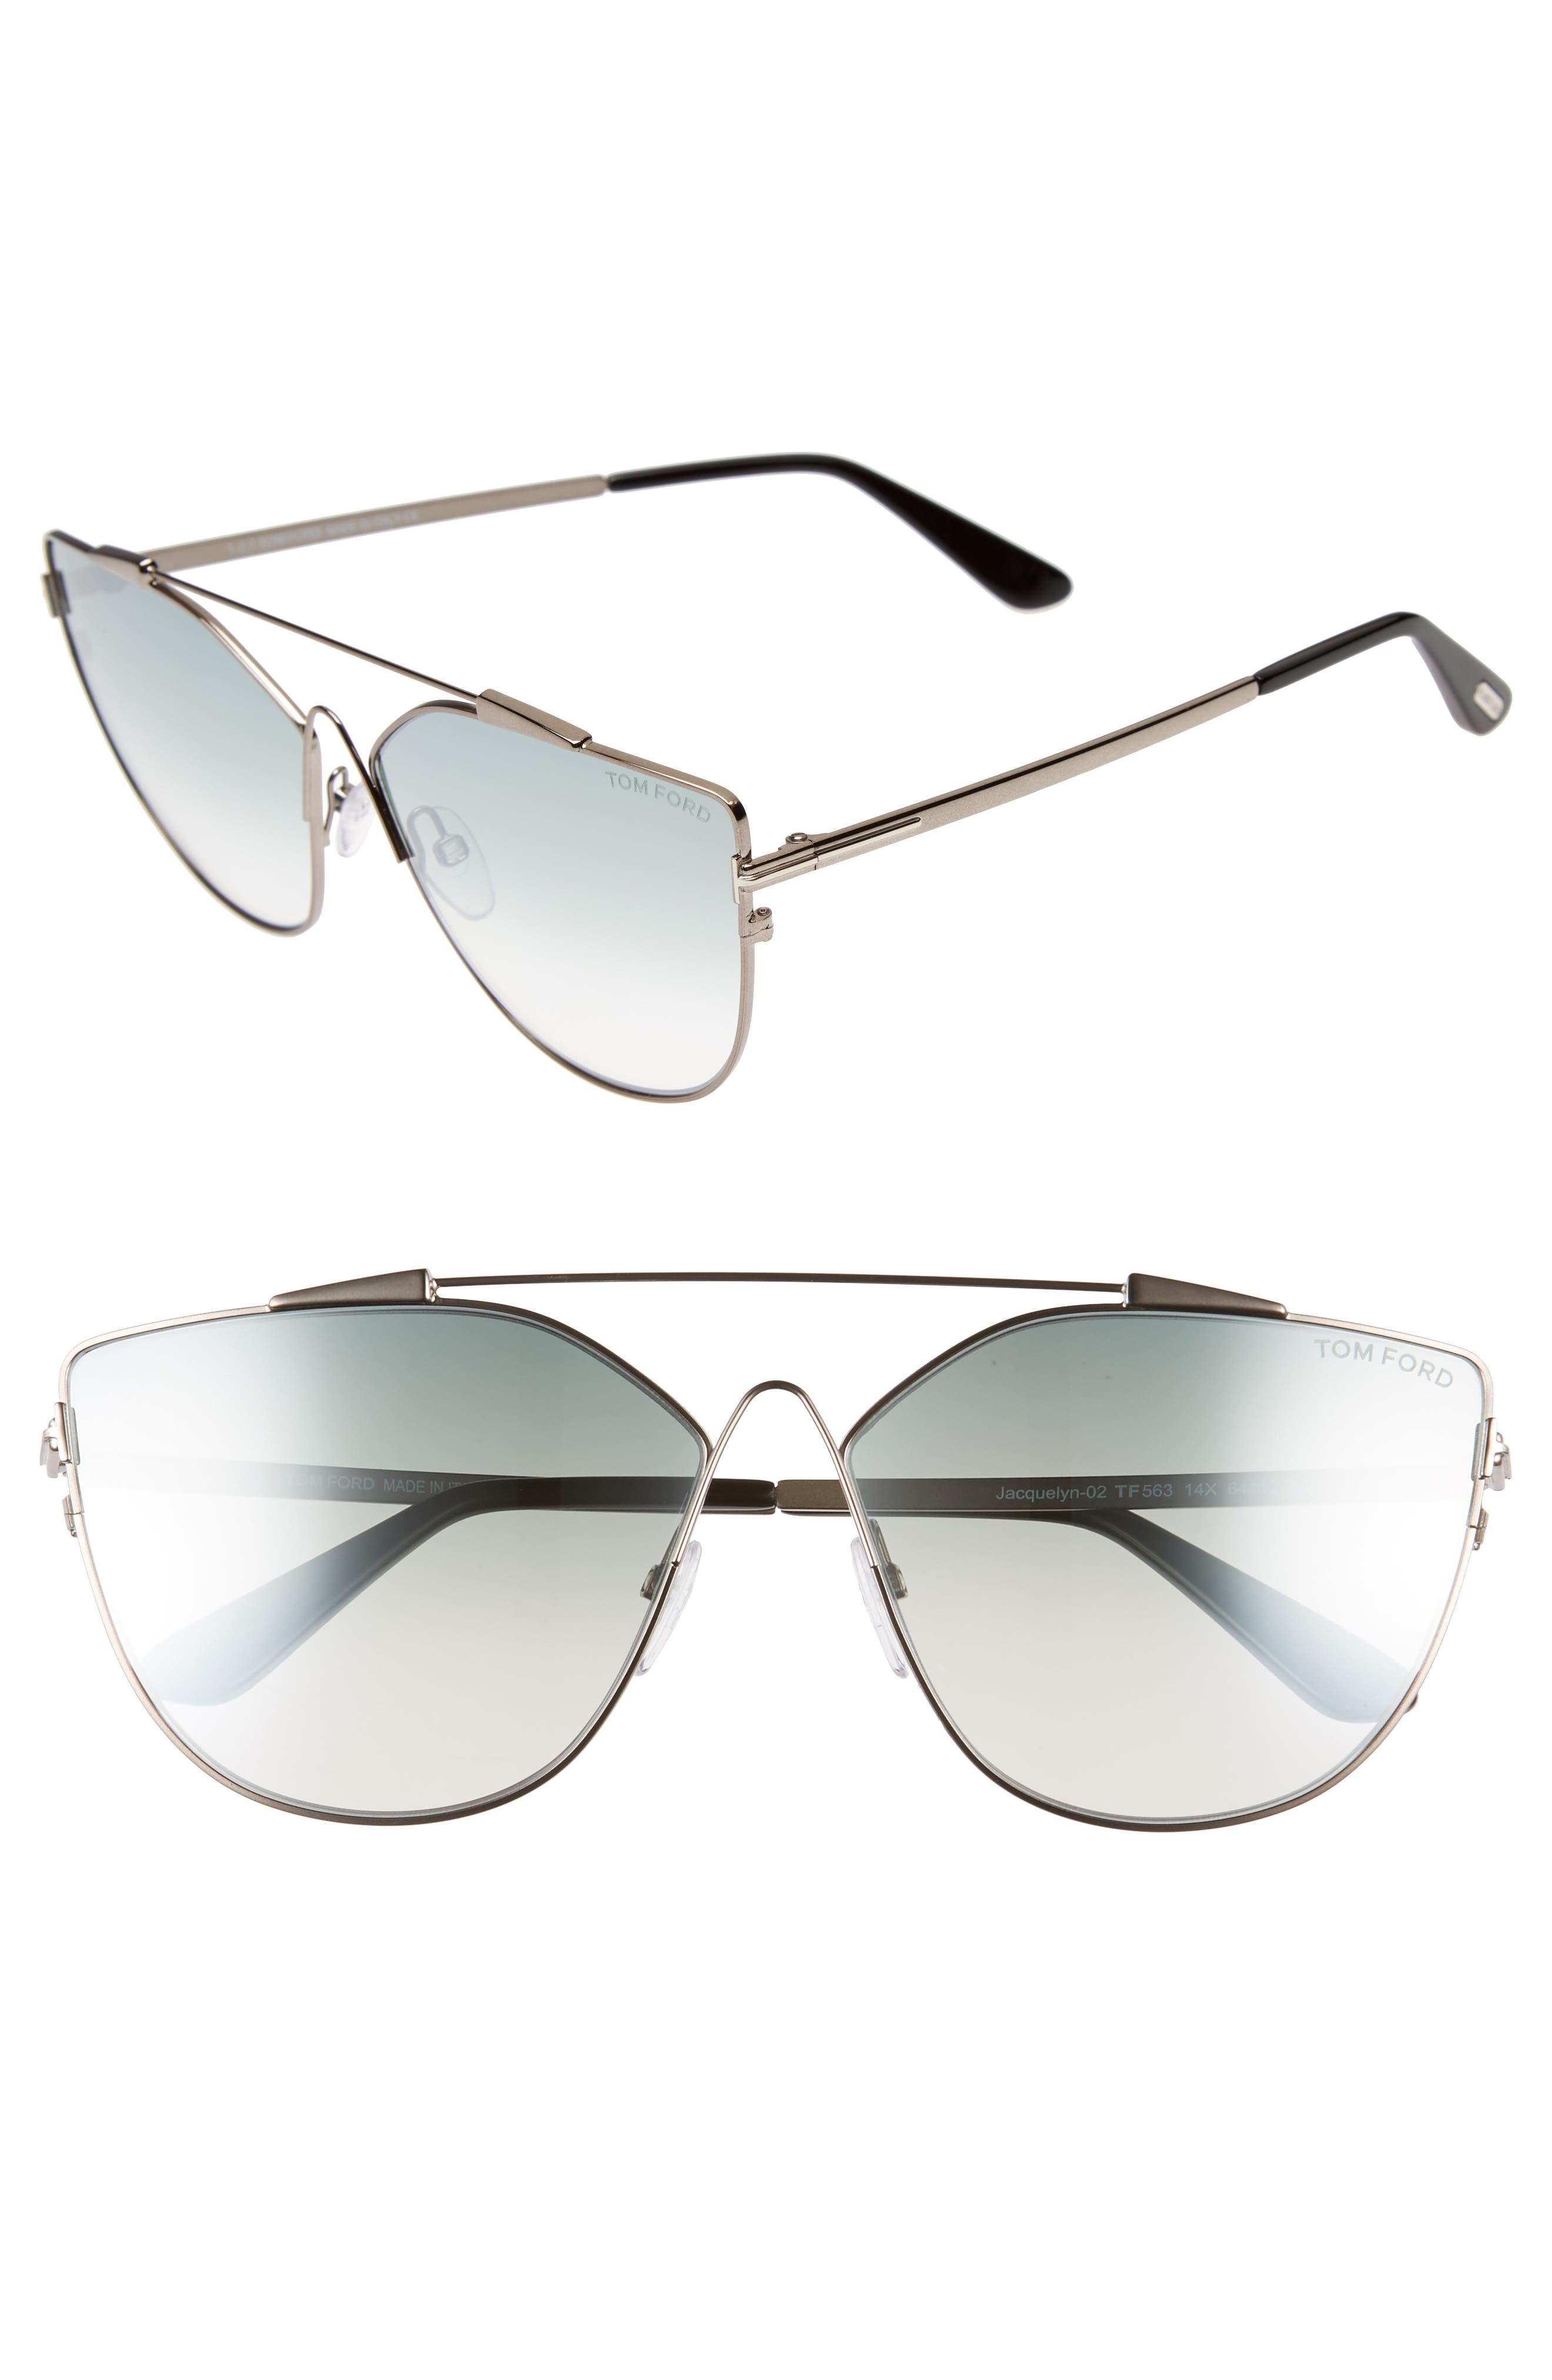 Jacquelyn 64mm Cat Eye Sunglasses,                             Main thumbnail 1, color,                             Light Ruthenium/ Blue Mirror